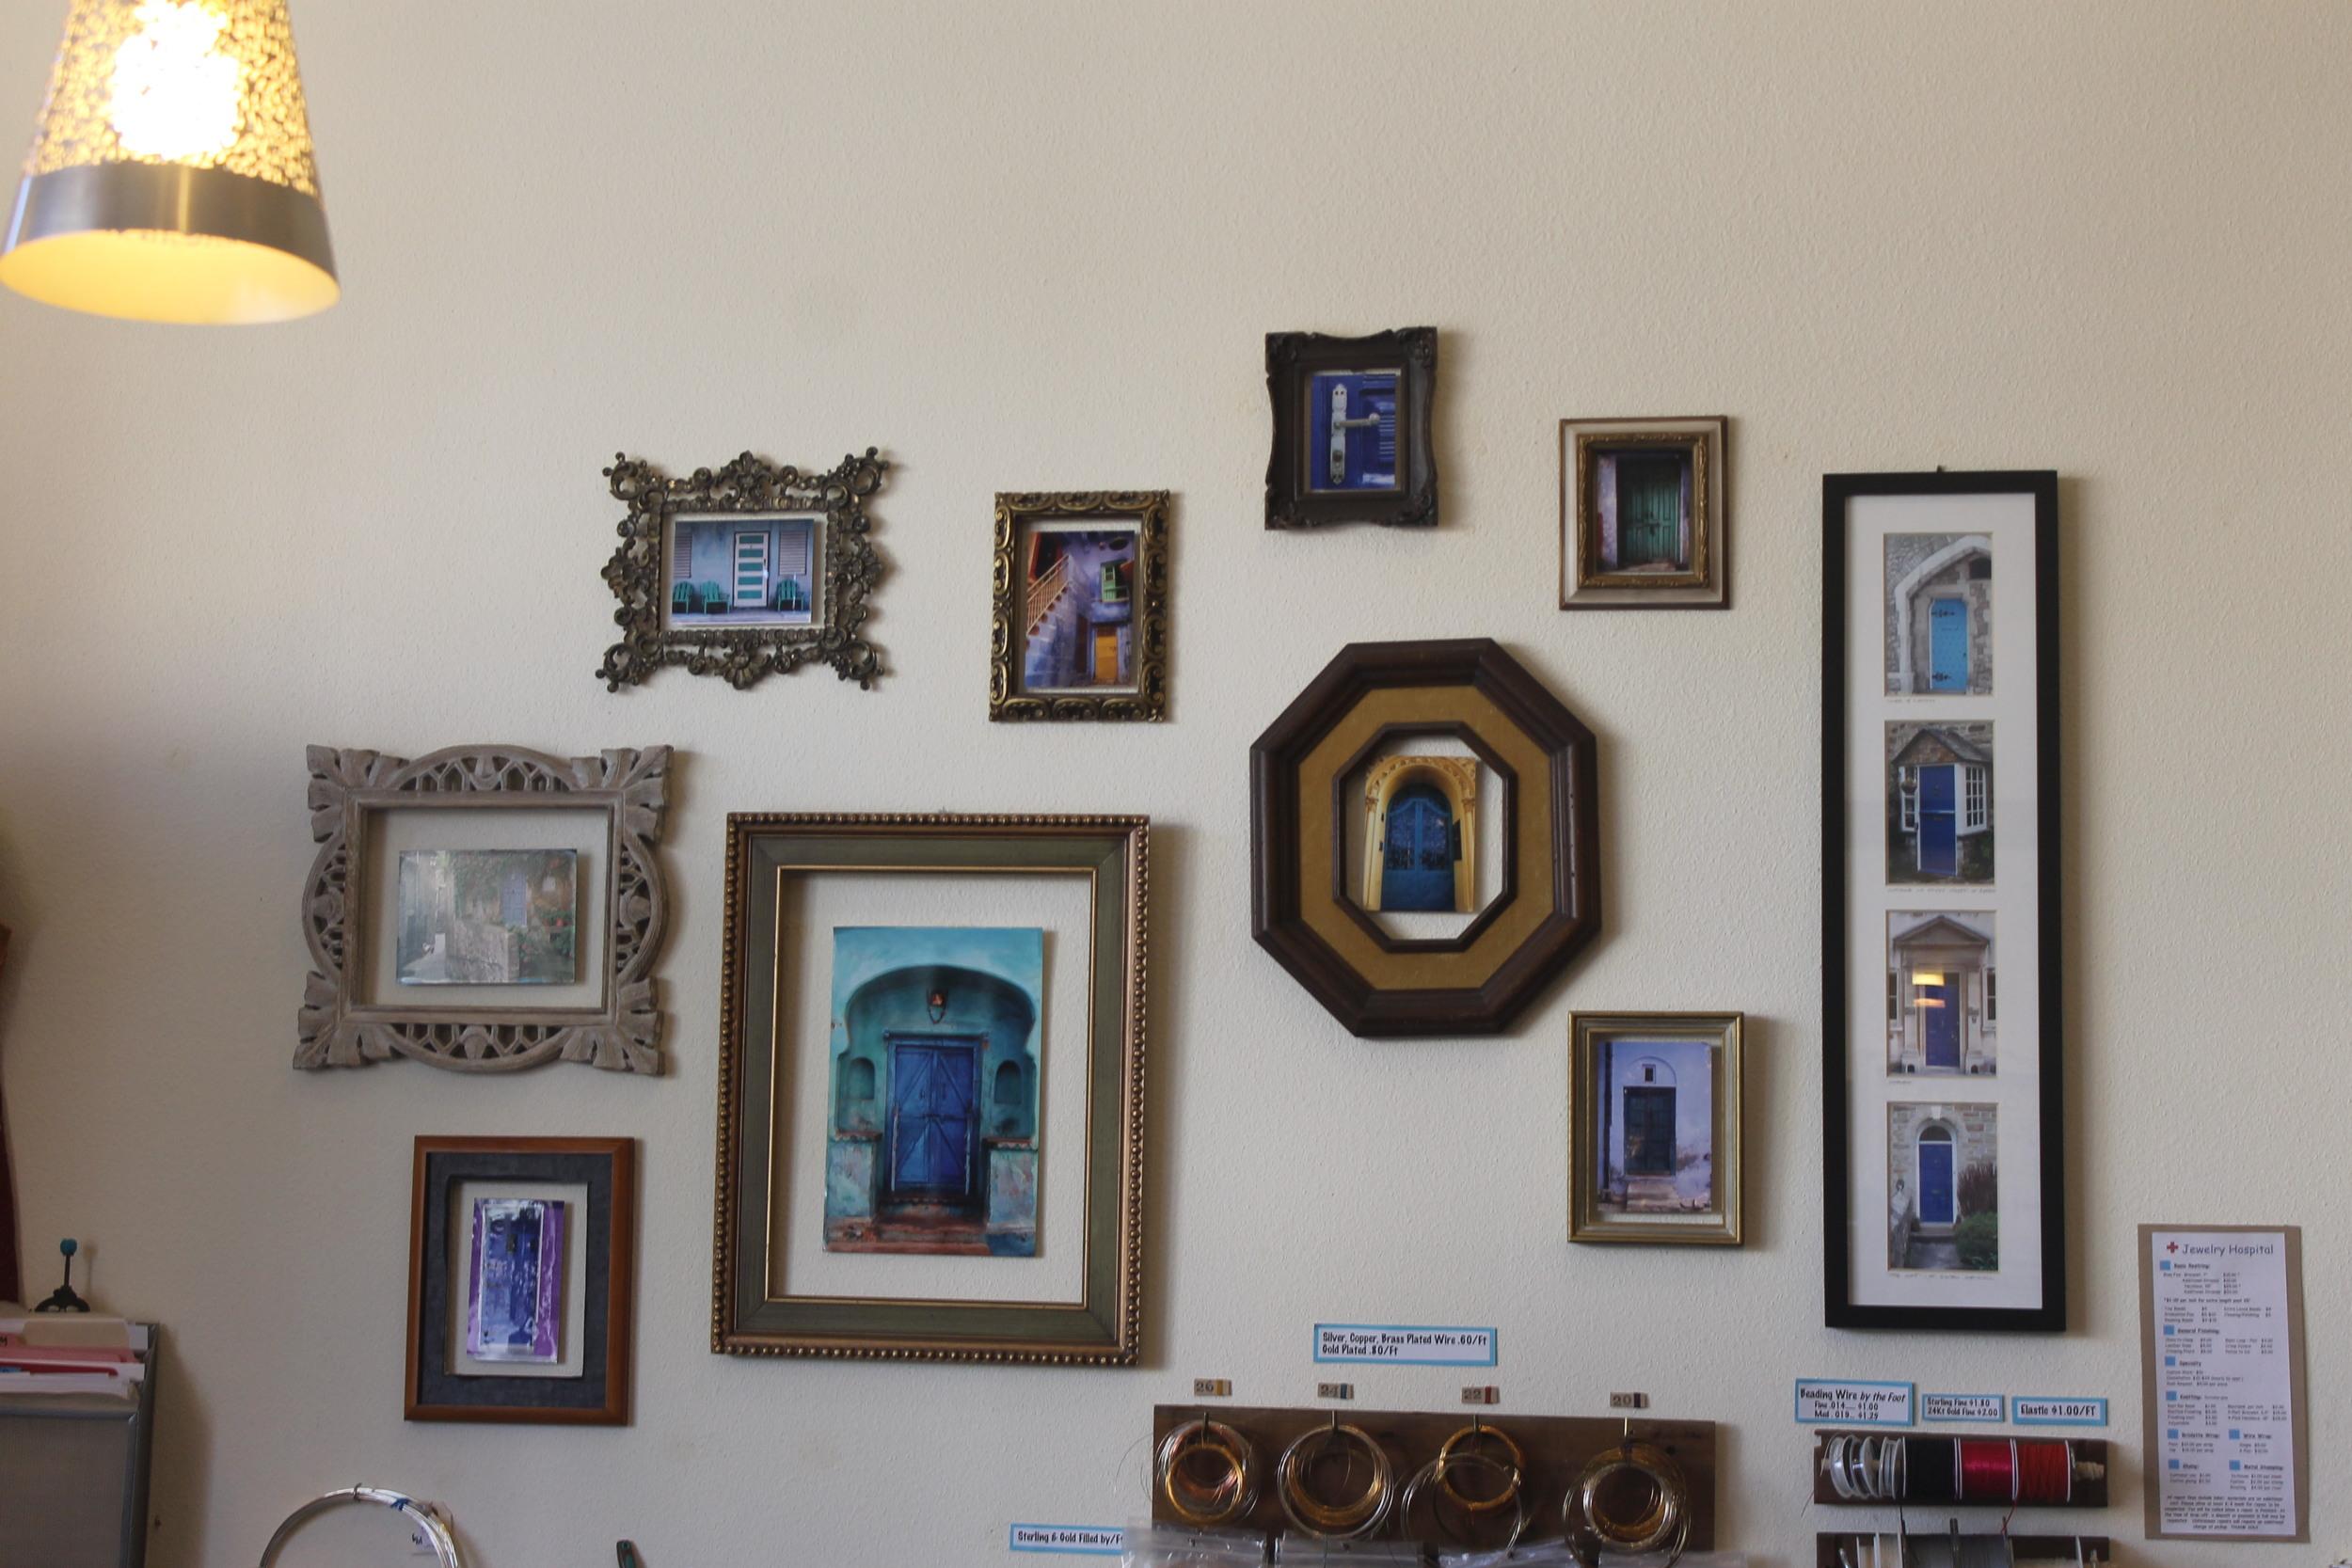 A gallery of blue door photos hang behind the cash wrap